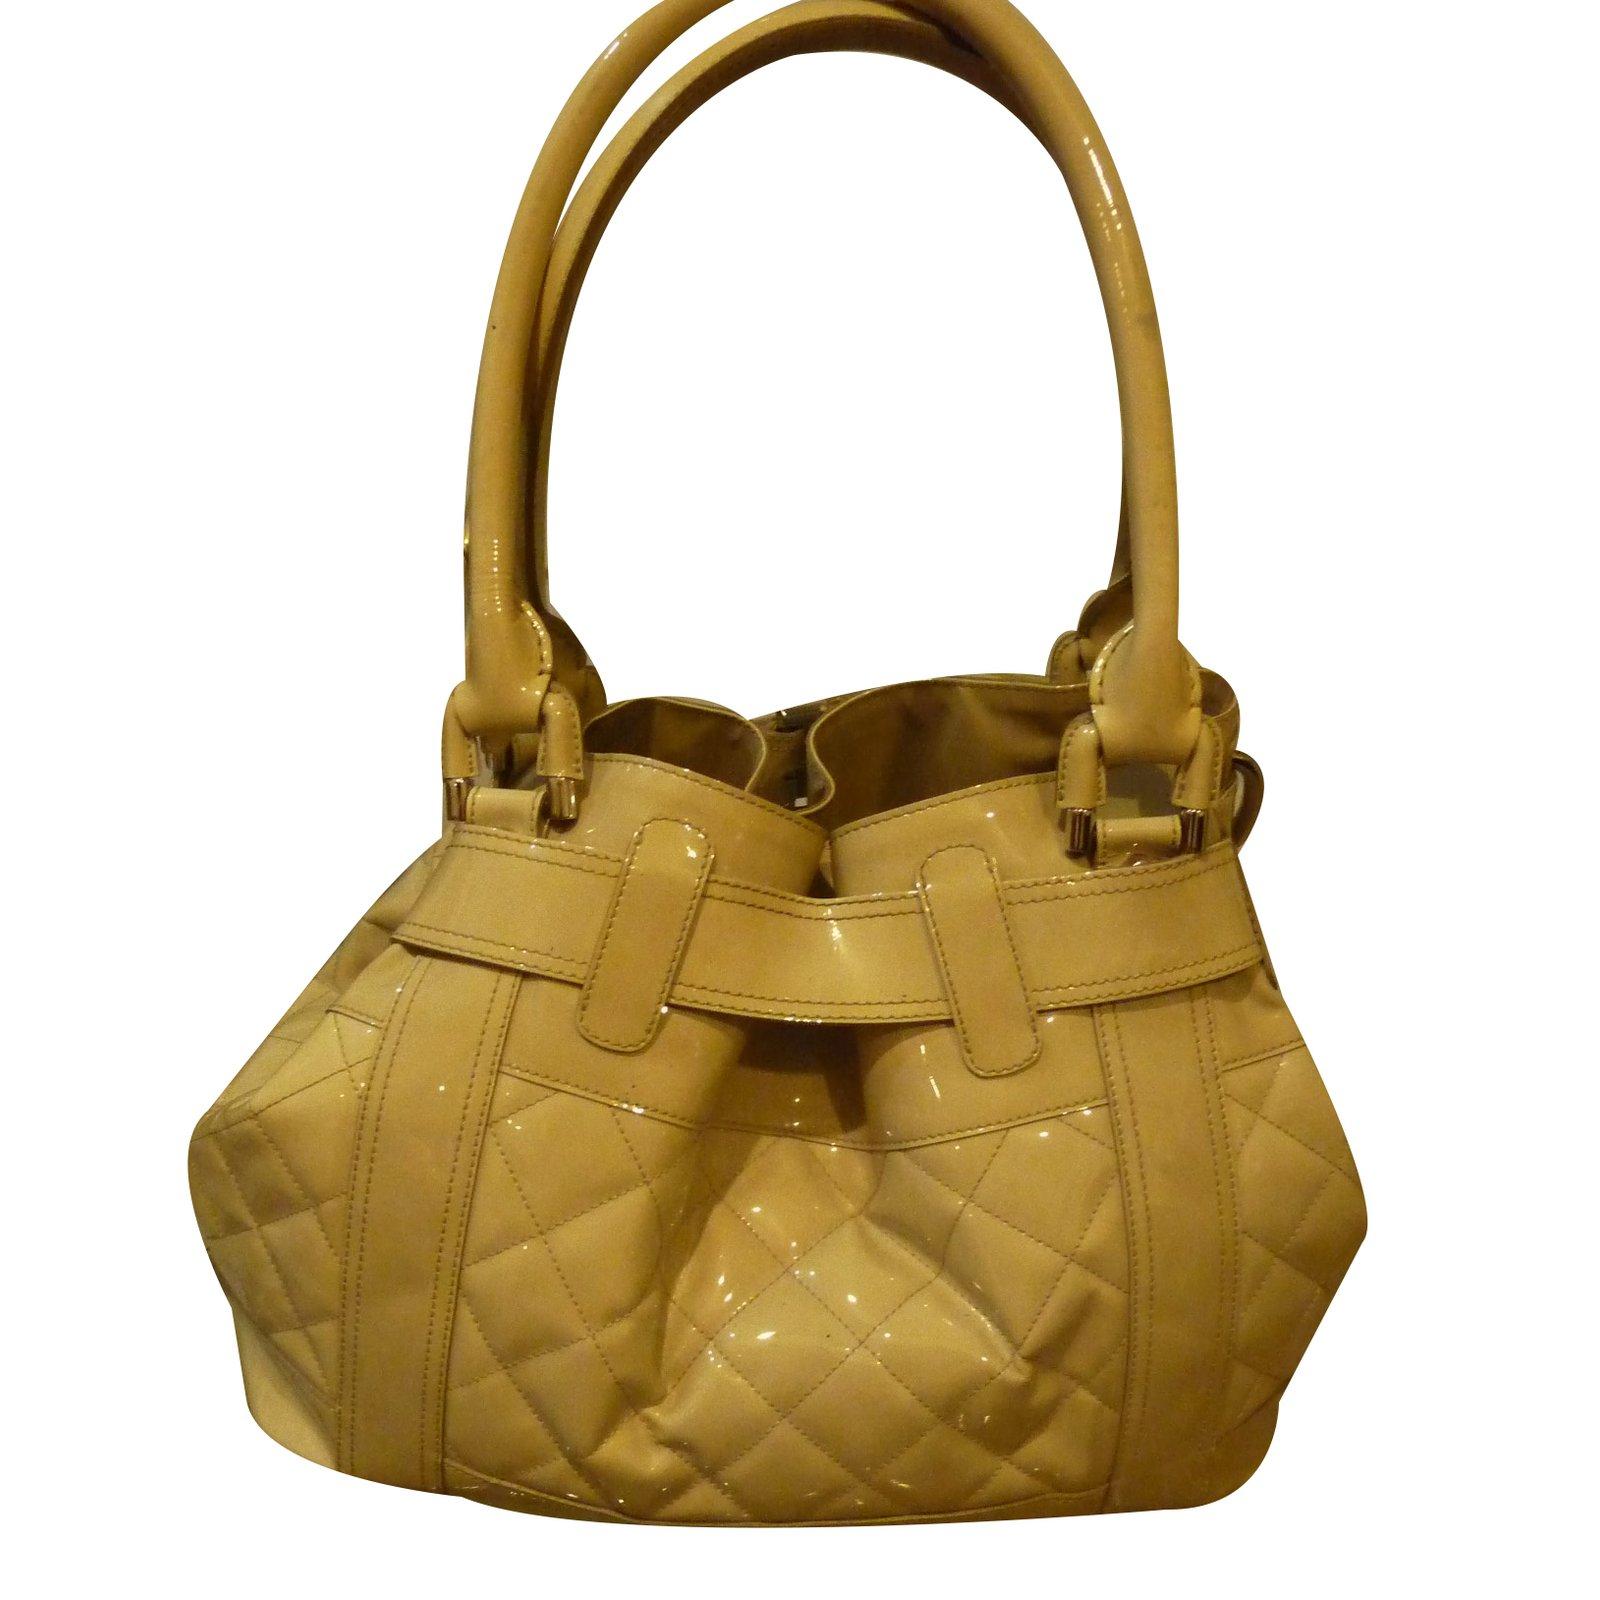 d1136ecfdfd9 Burberry Beaton model Handbags Patent leather Cream ref.33681 - Joli Closet